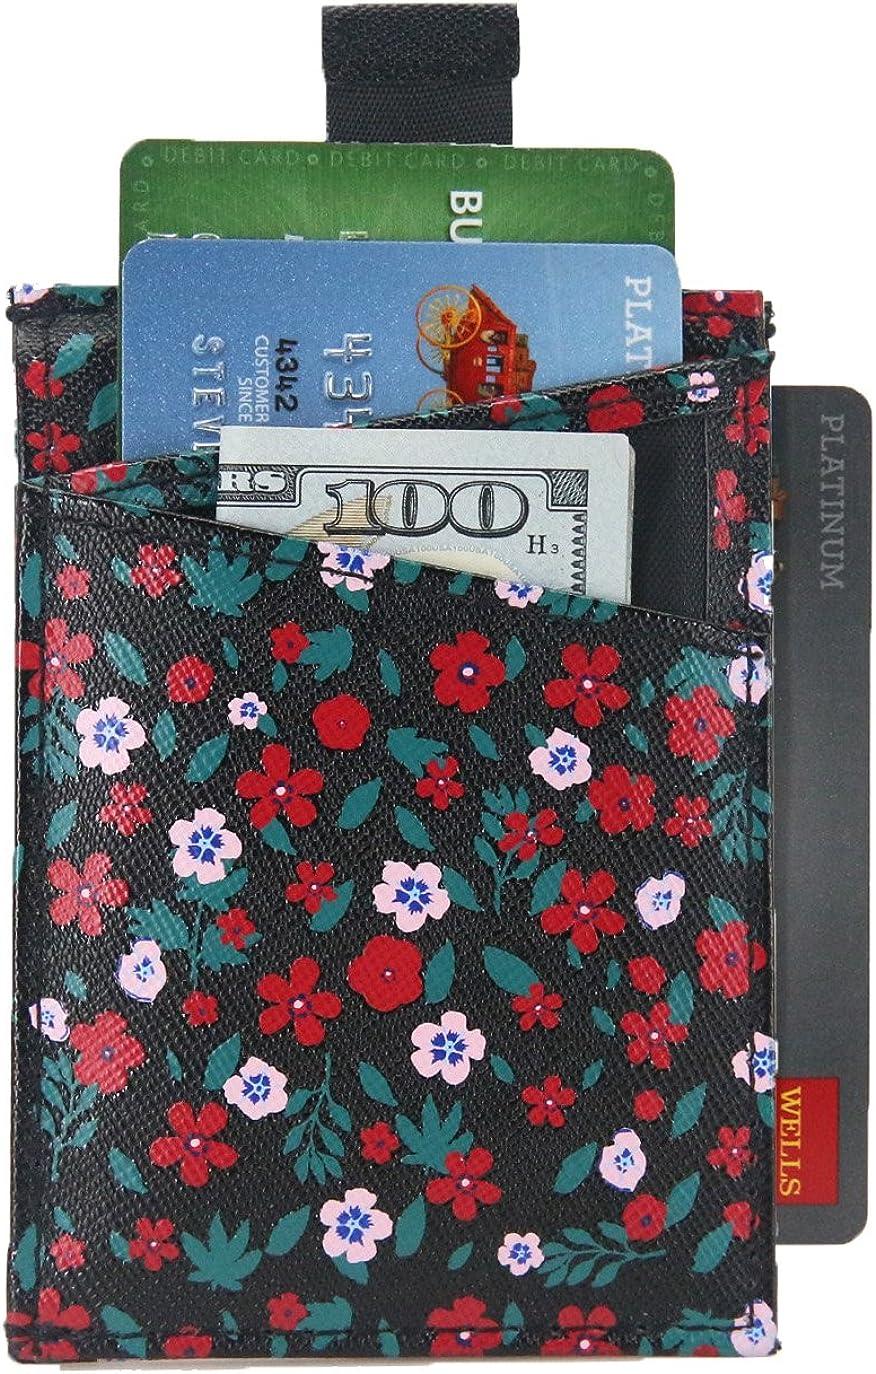 Slim Wallet 5.0 By DASH Co. - Minimal Wallet For Men & Women - RFID Blocking, Quickdraw & Pull Tab